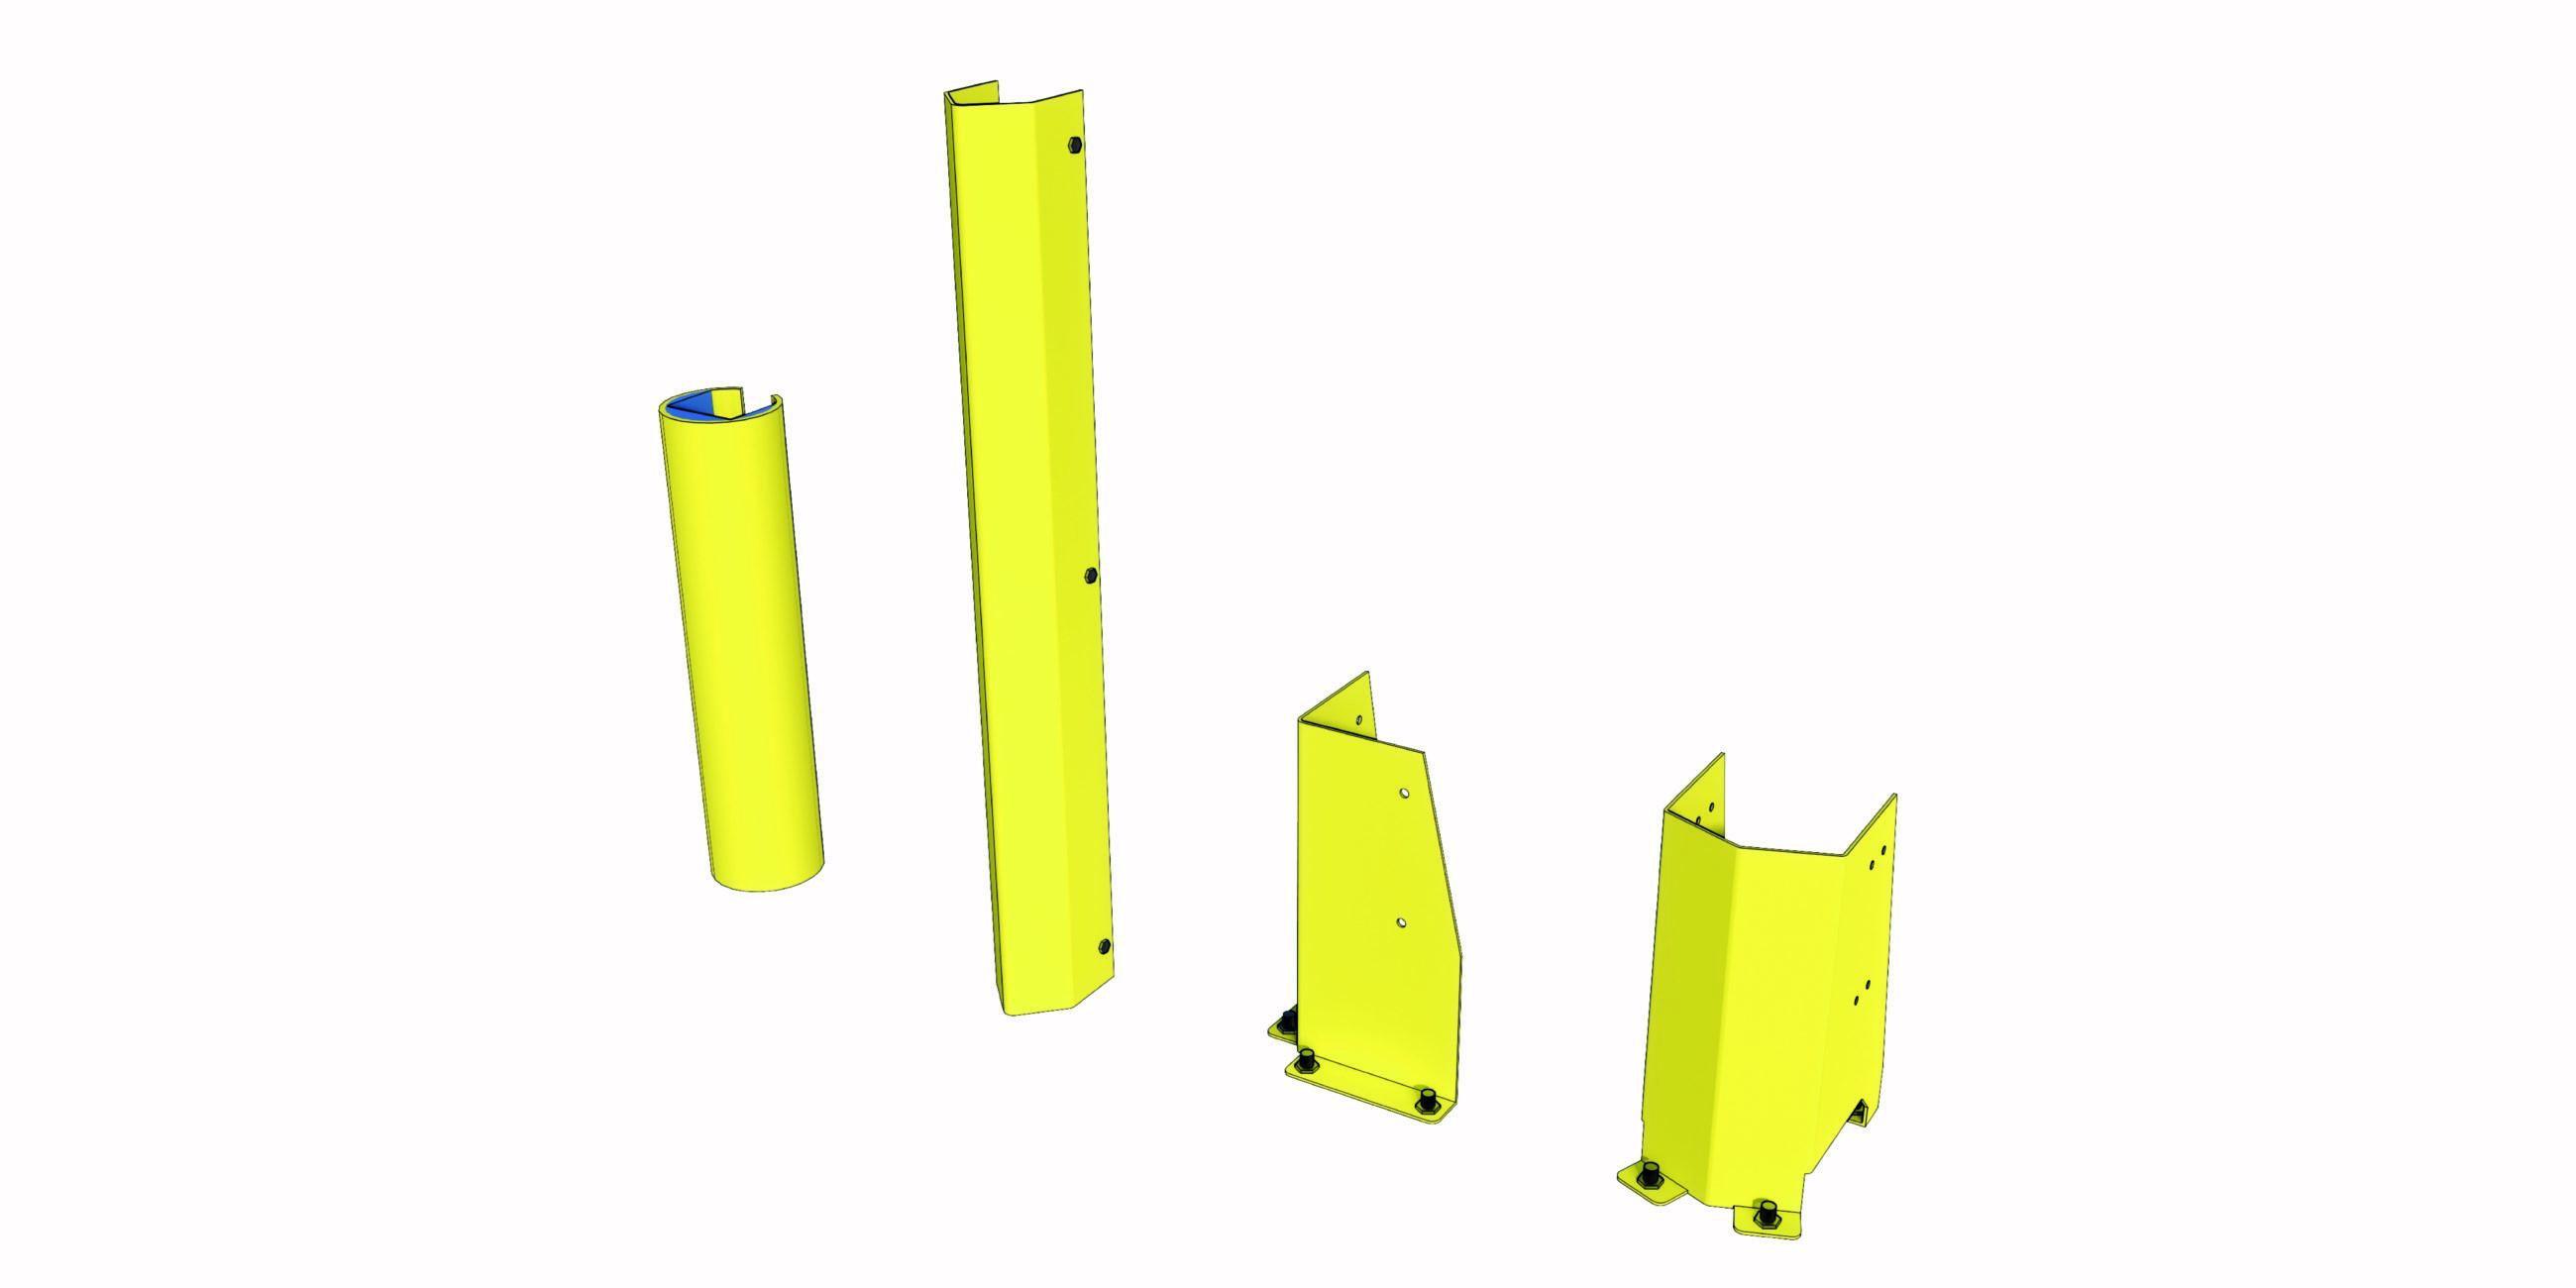 Palletstellingen kop bescherming upright protection